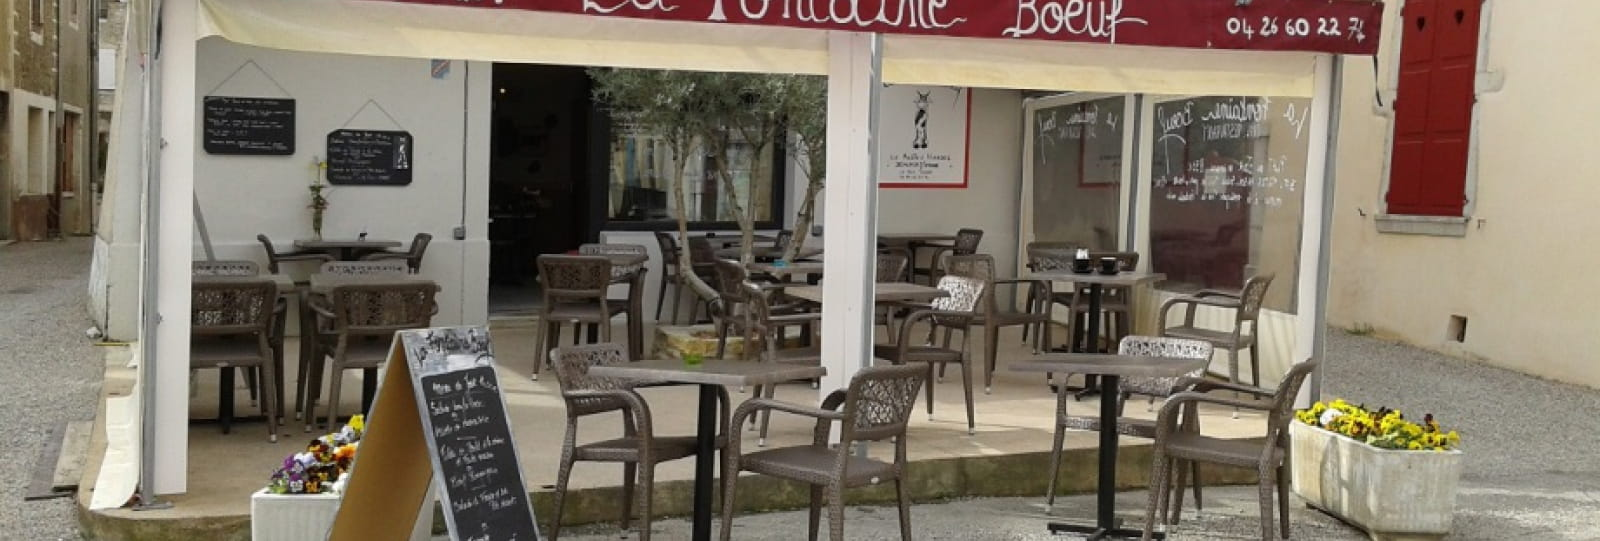 La Fontaine Boeuf